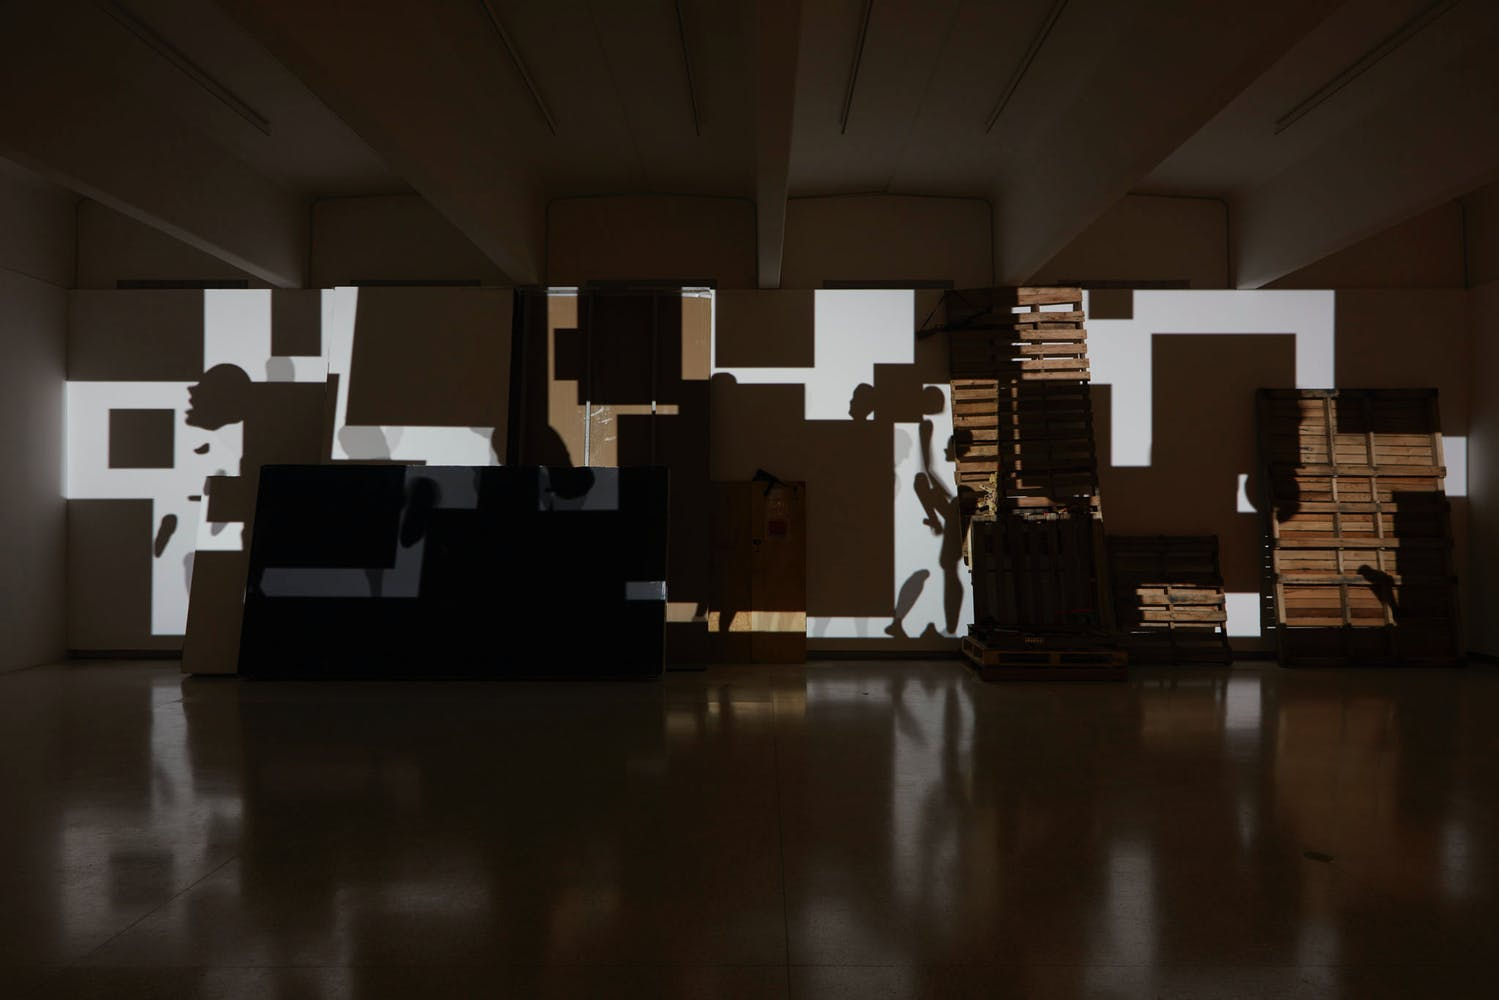 View of the exhibition Less Than One, 2016; Paul Chan, Sade for Sade's sake, 2009 (Photo: Gene Pittman, ©Walker Art Center)